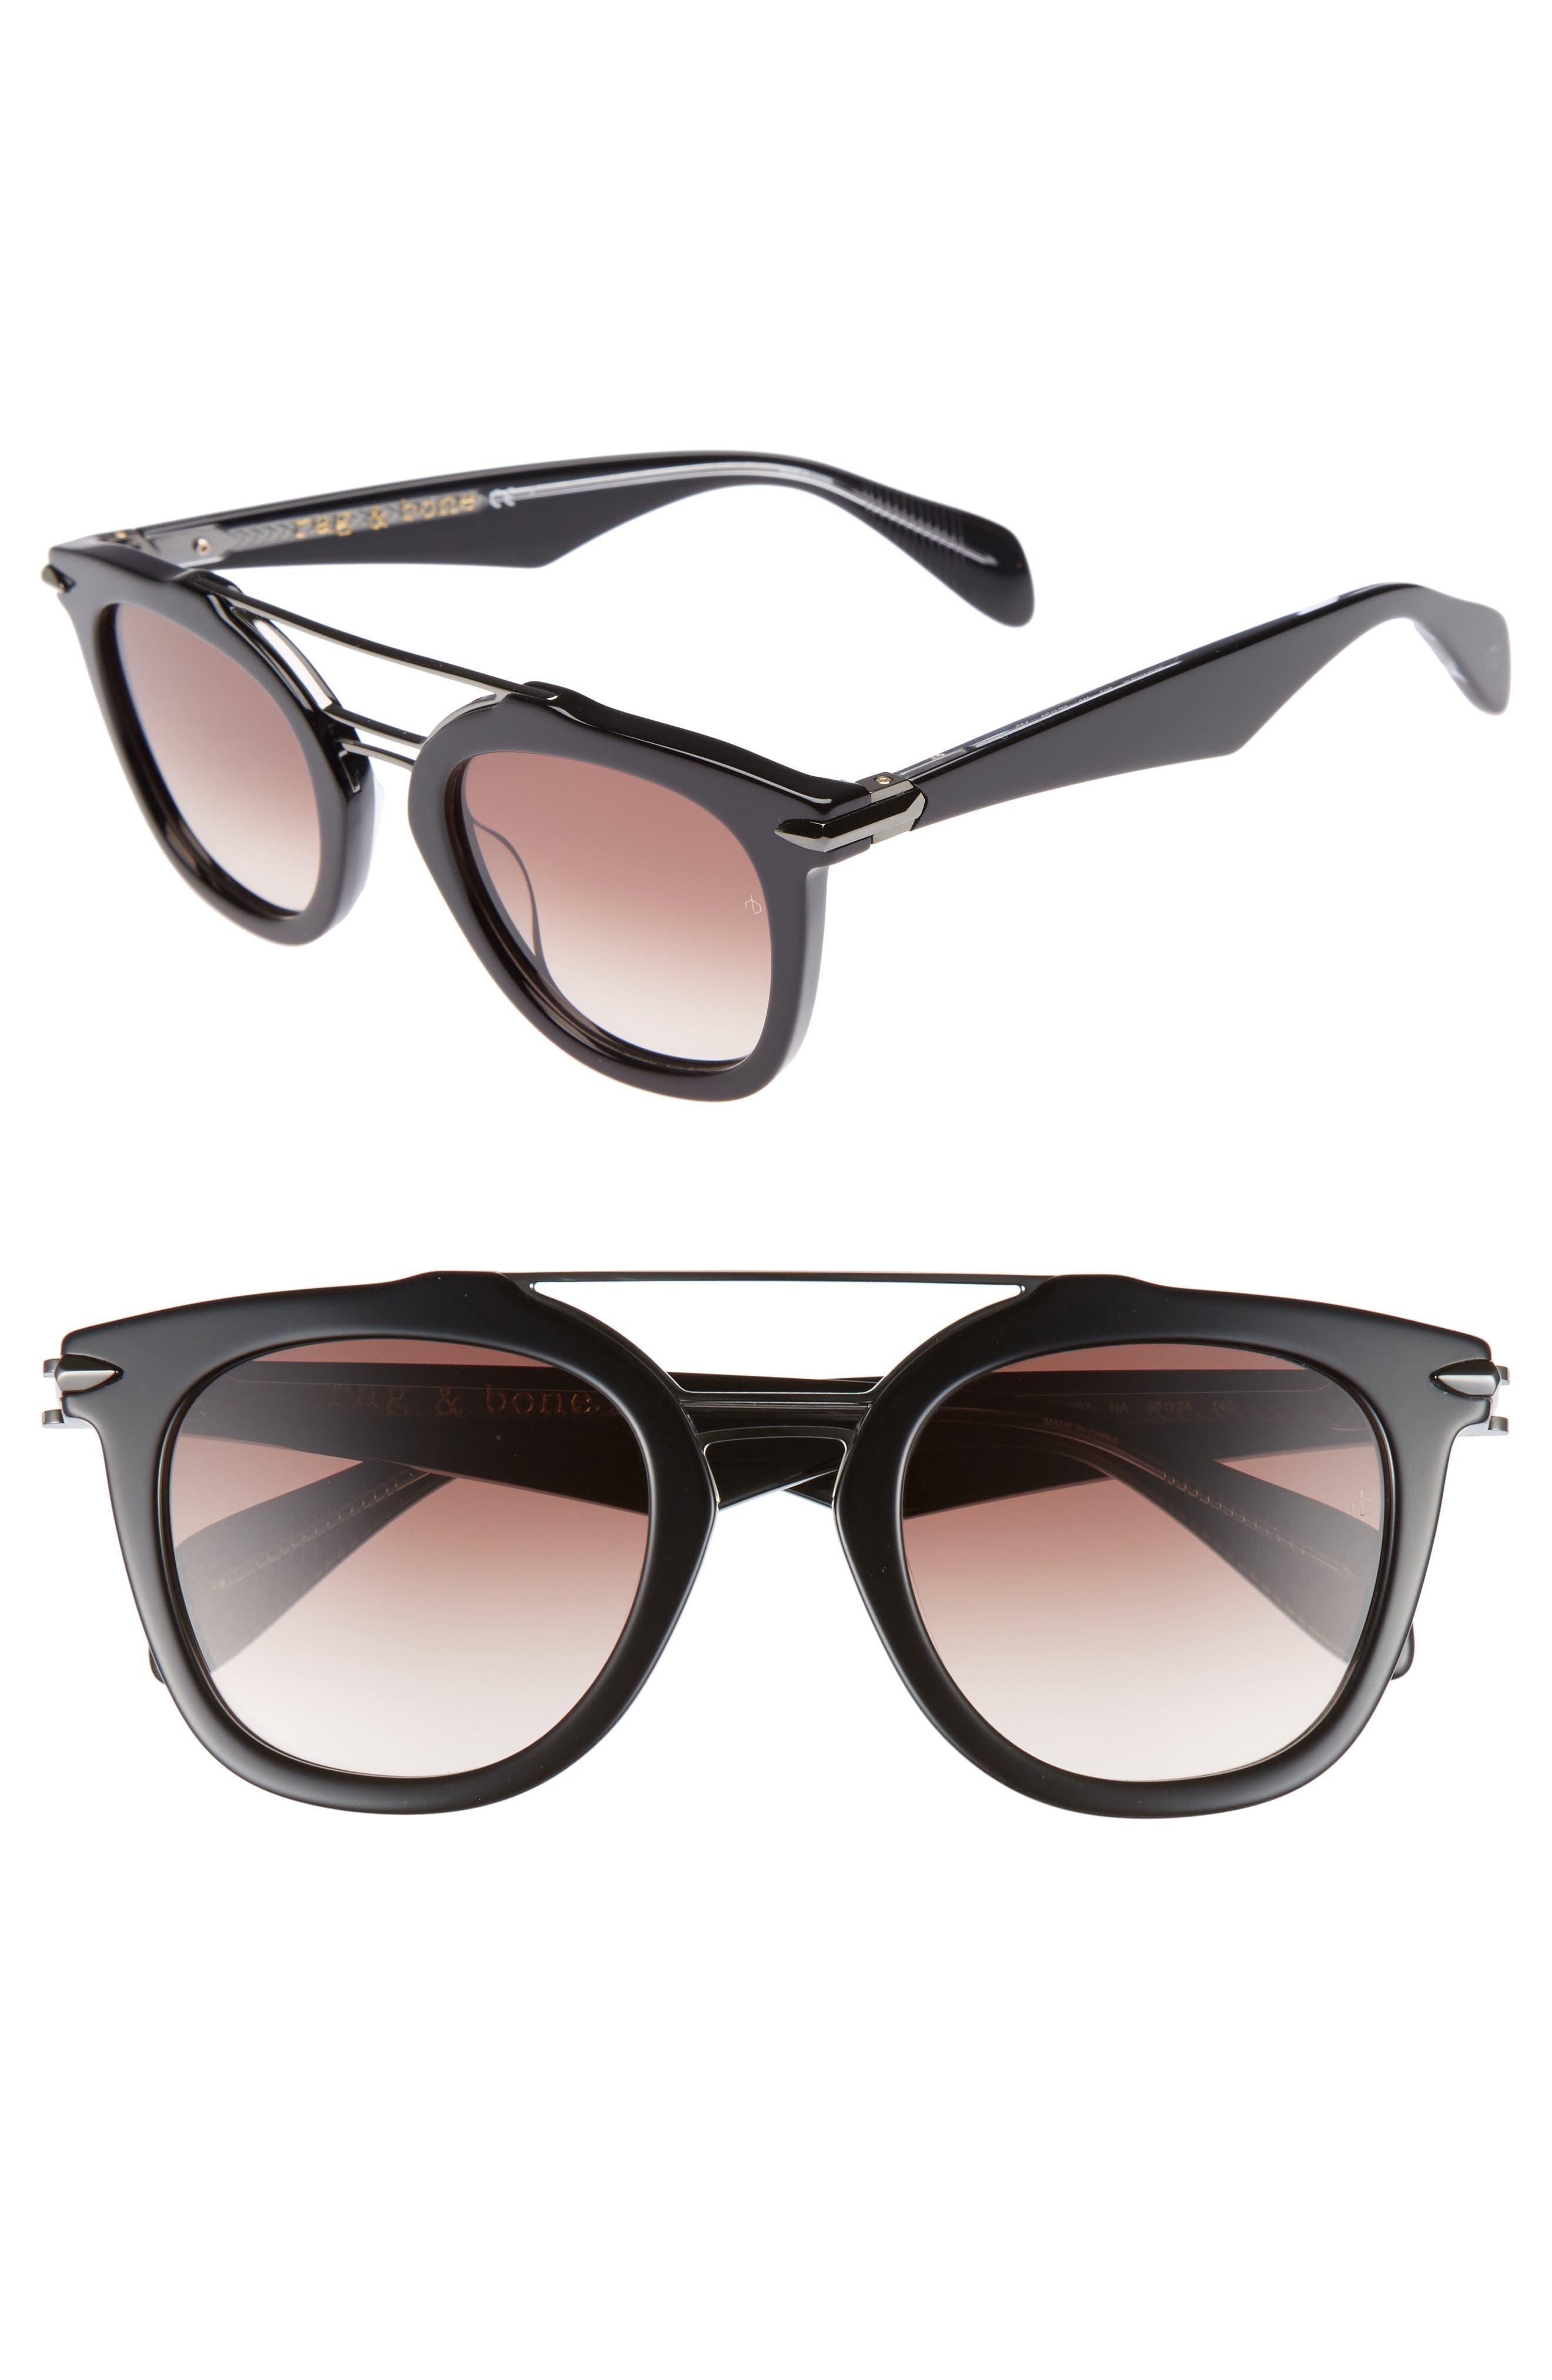 50mm Round Aviator Sunglasses,                         Main,                         color, BLACK